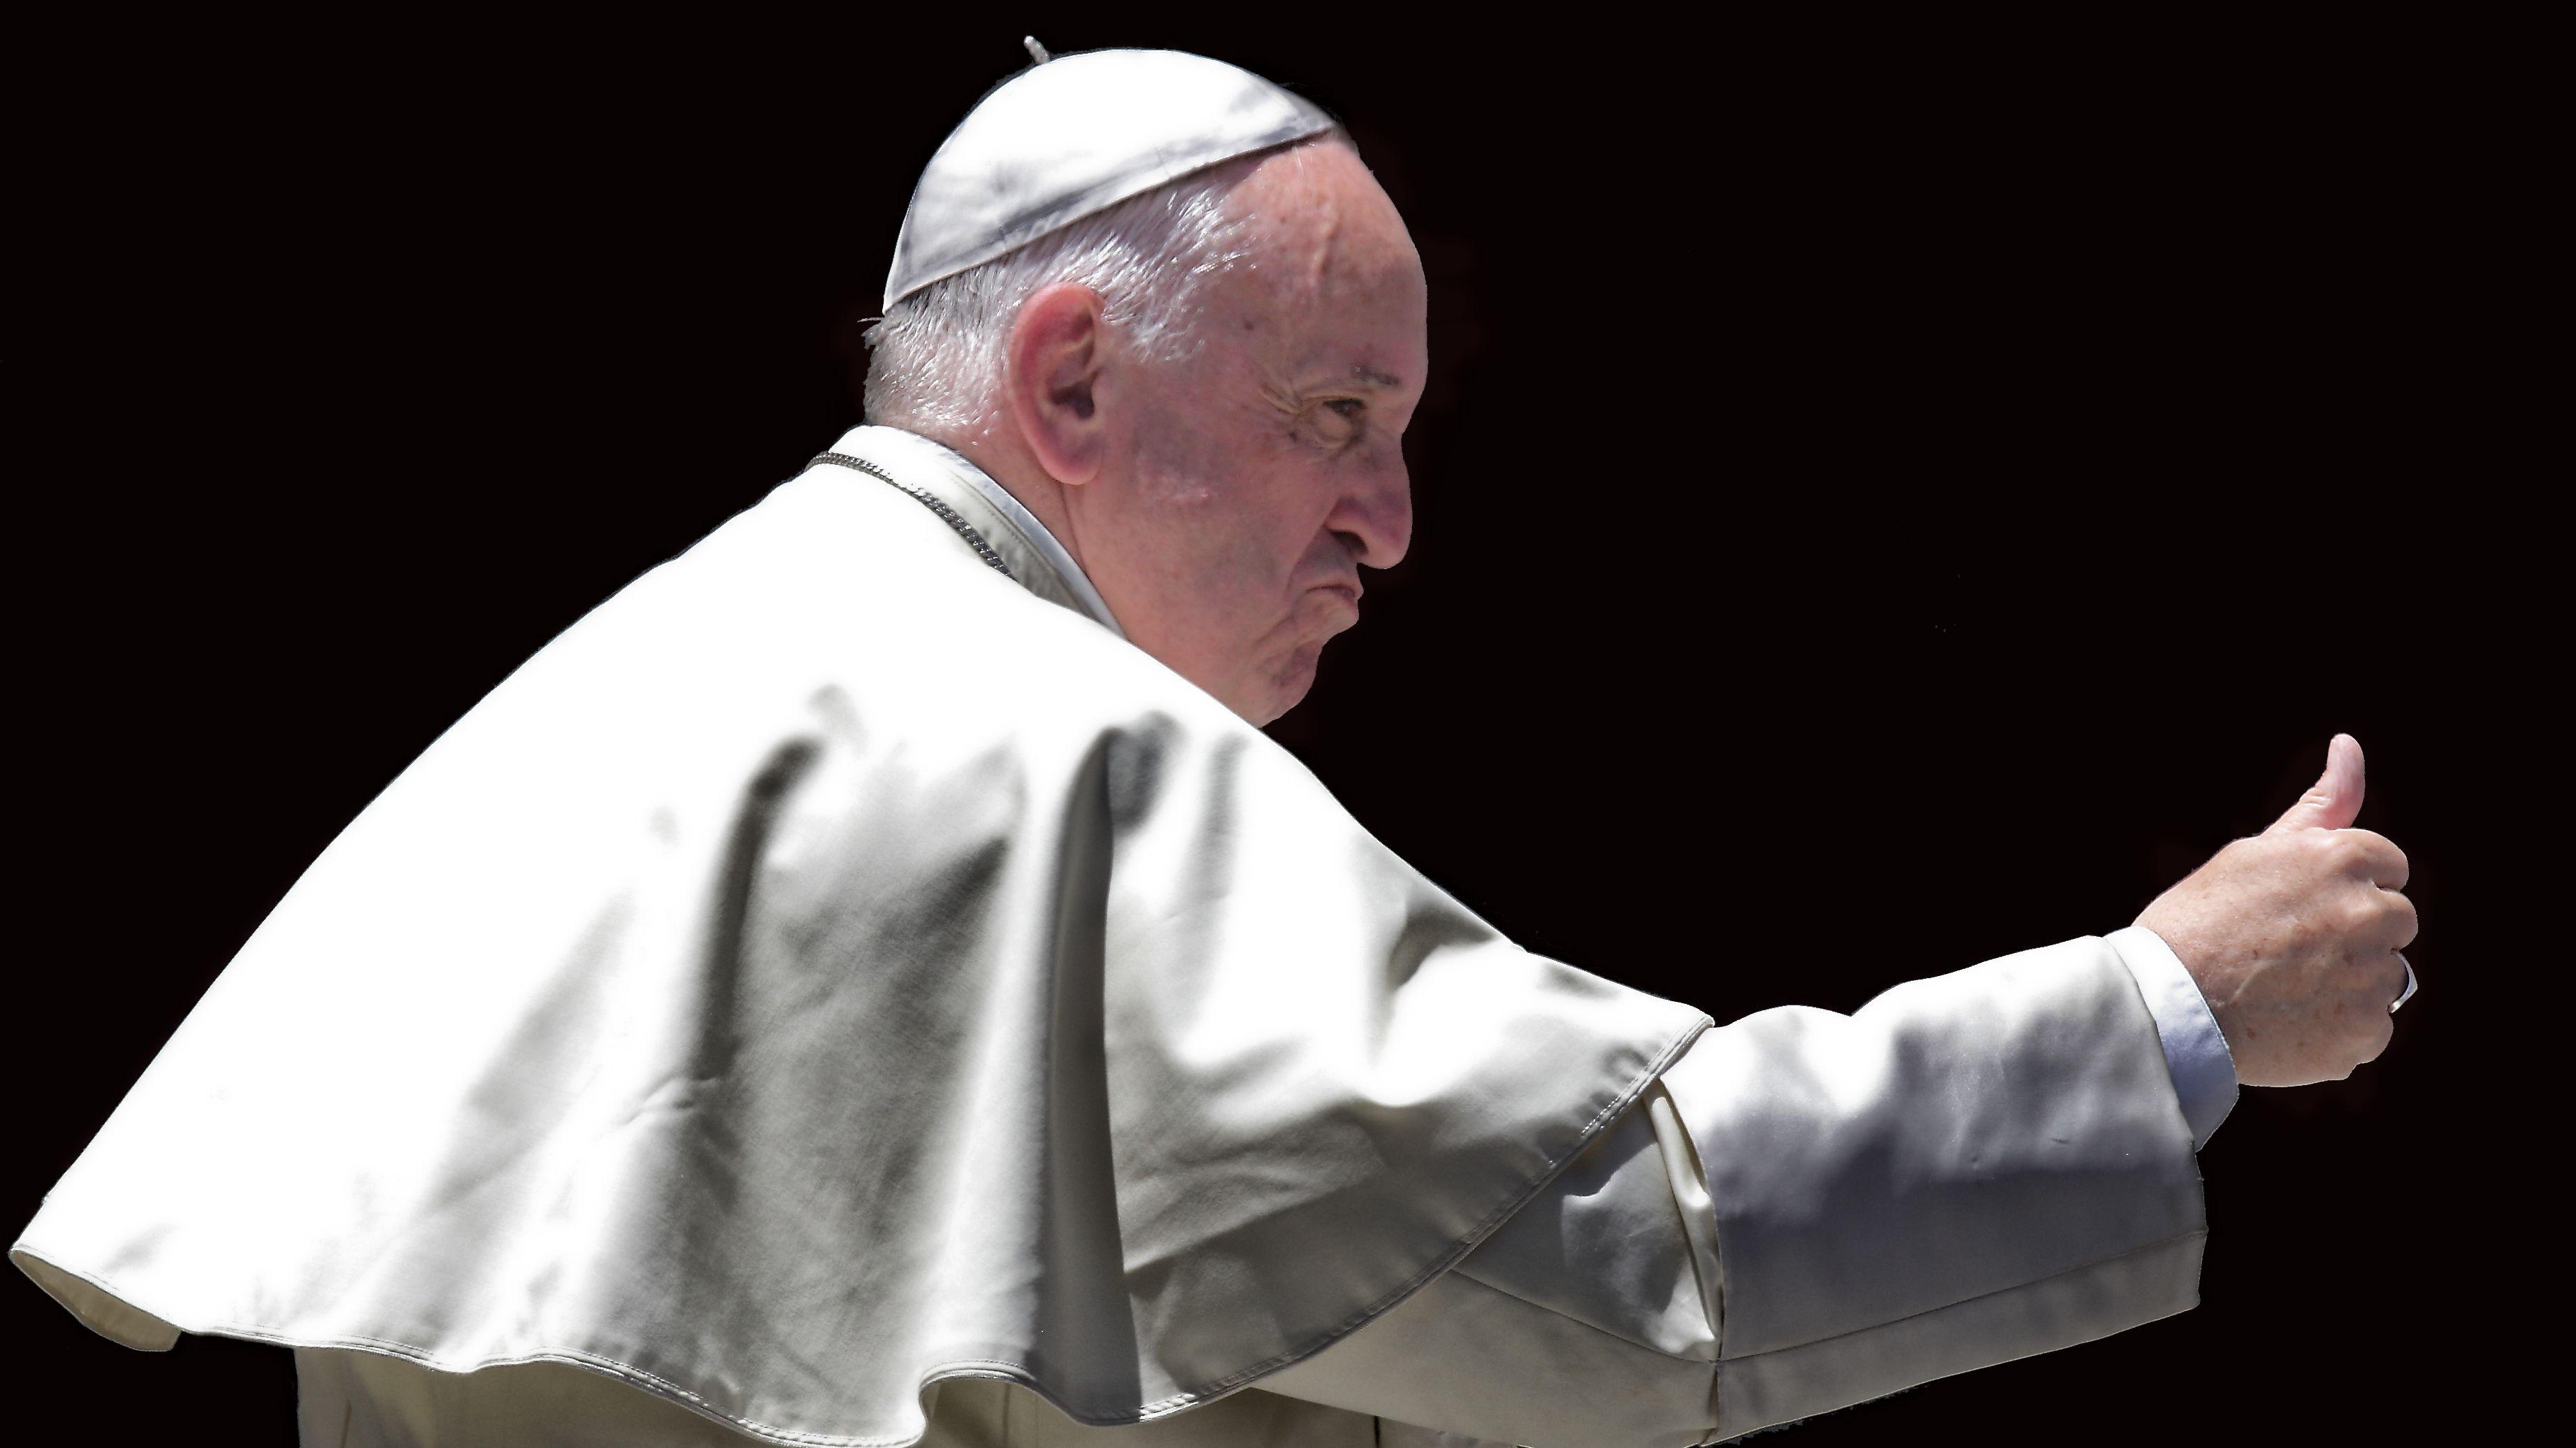 Papst Franziskus bei Generalaudienz 2016